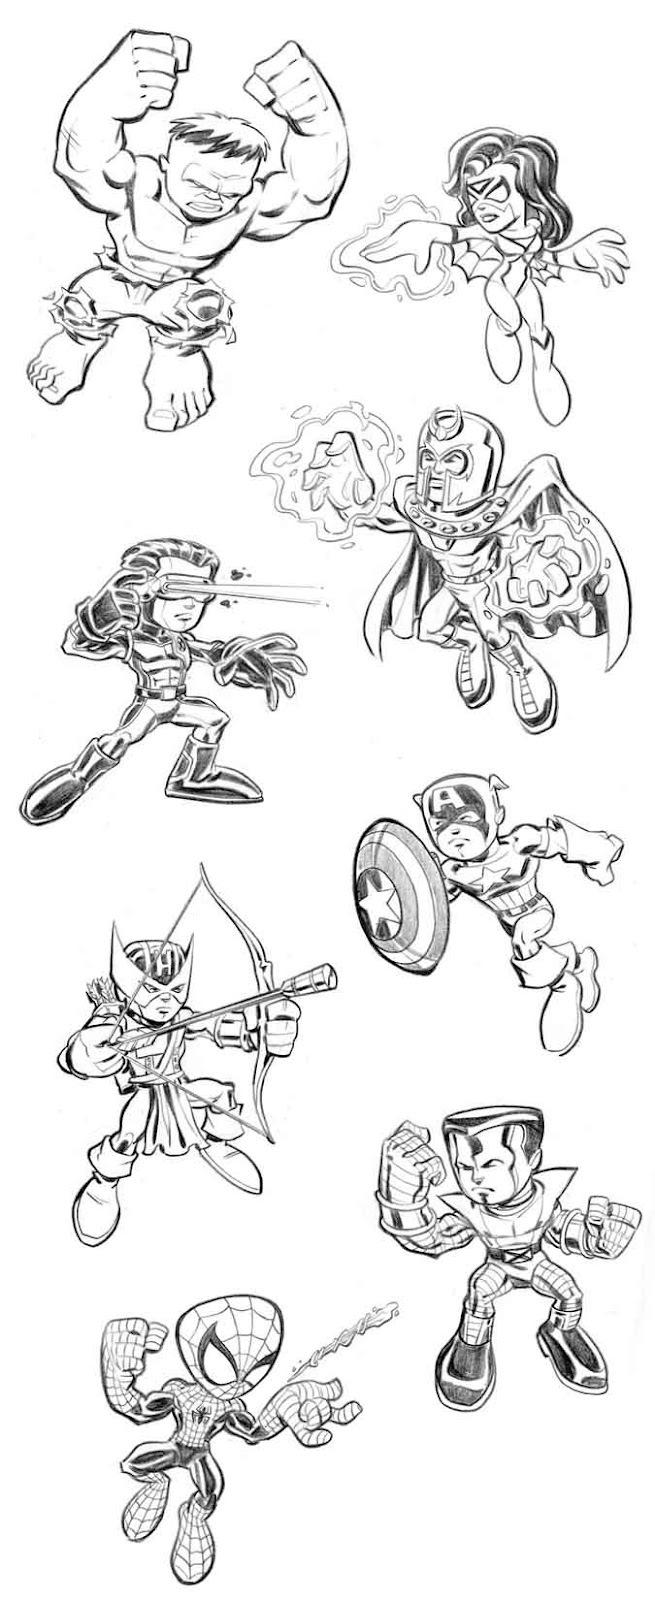 Os Vingadores Desenhos Para Colorir Pintar E Imprimir Gratis